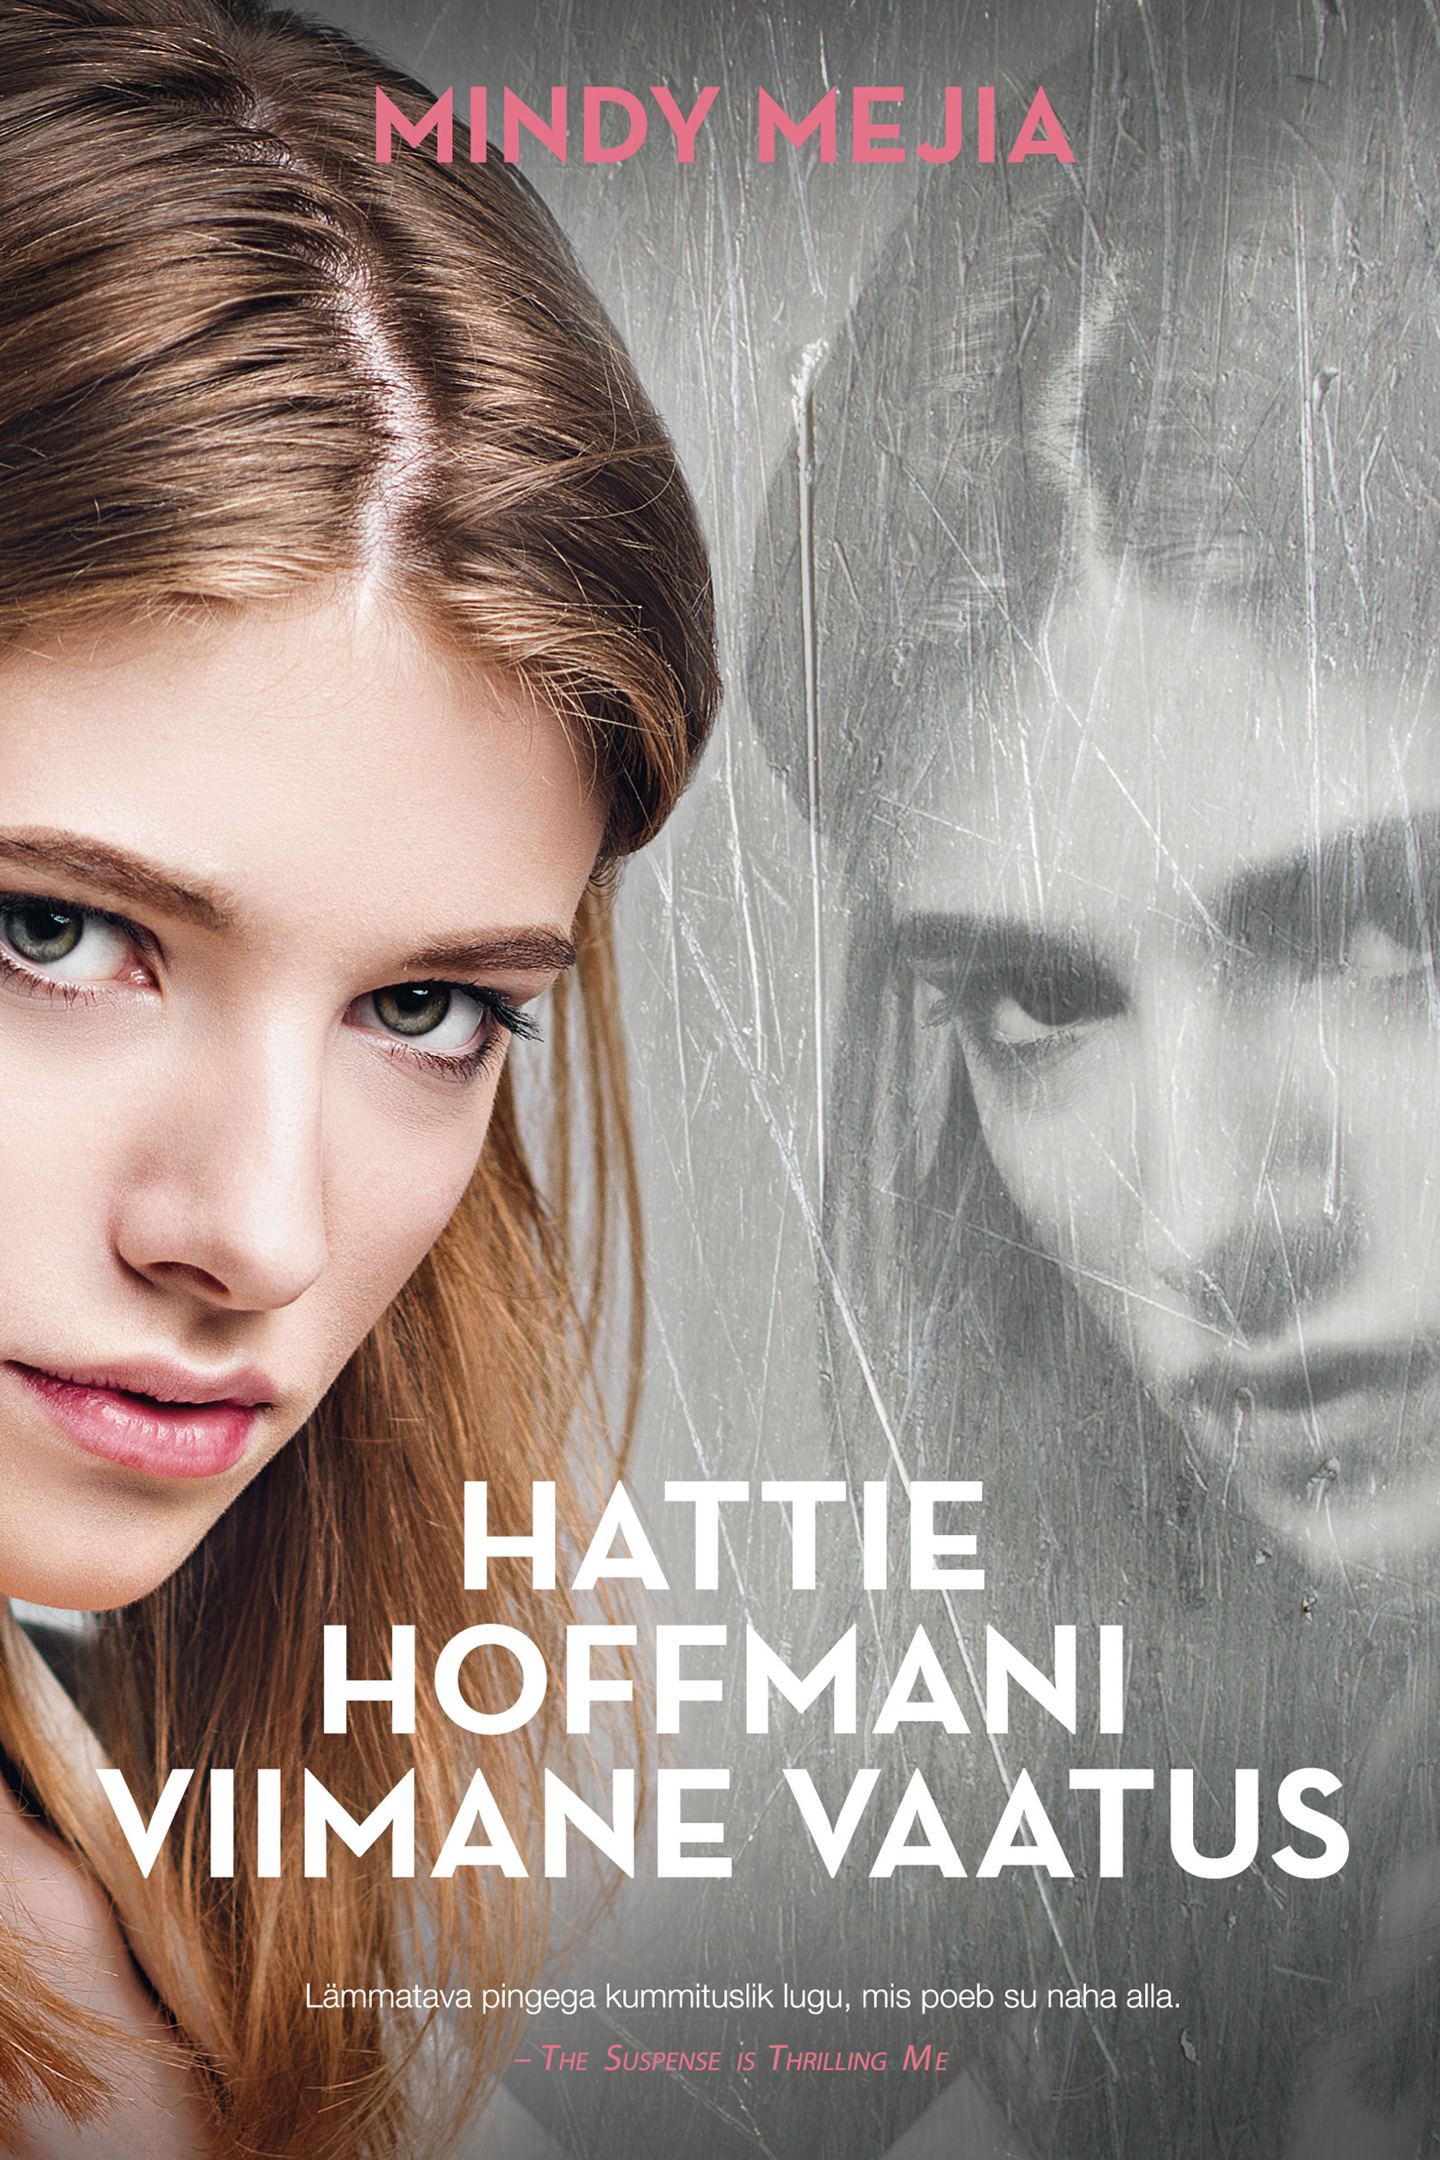 Mindy Mejia Hattie Hoffmani viimane vaatus hattie big sky